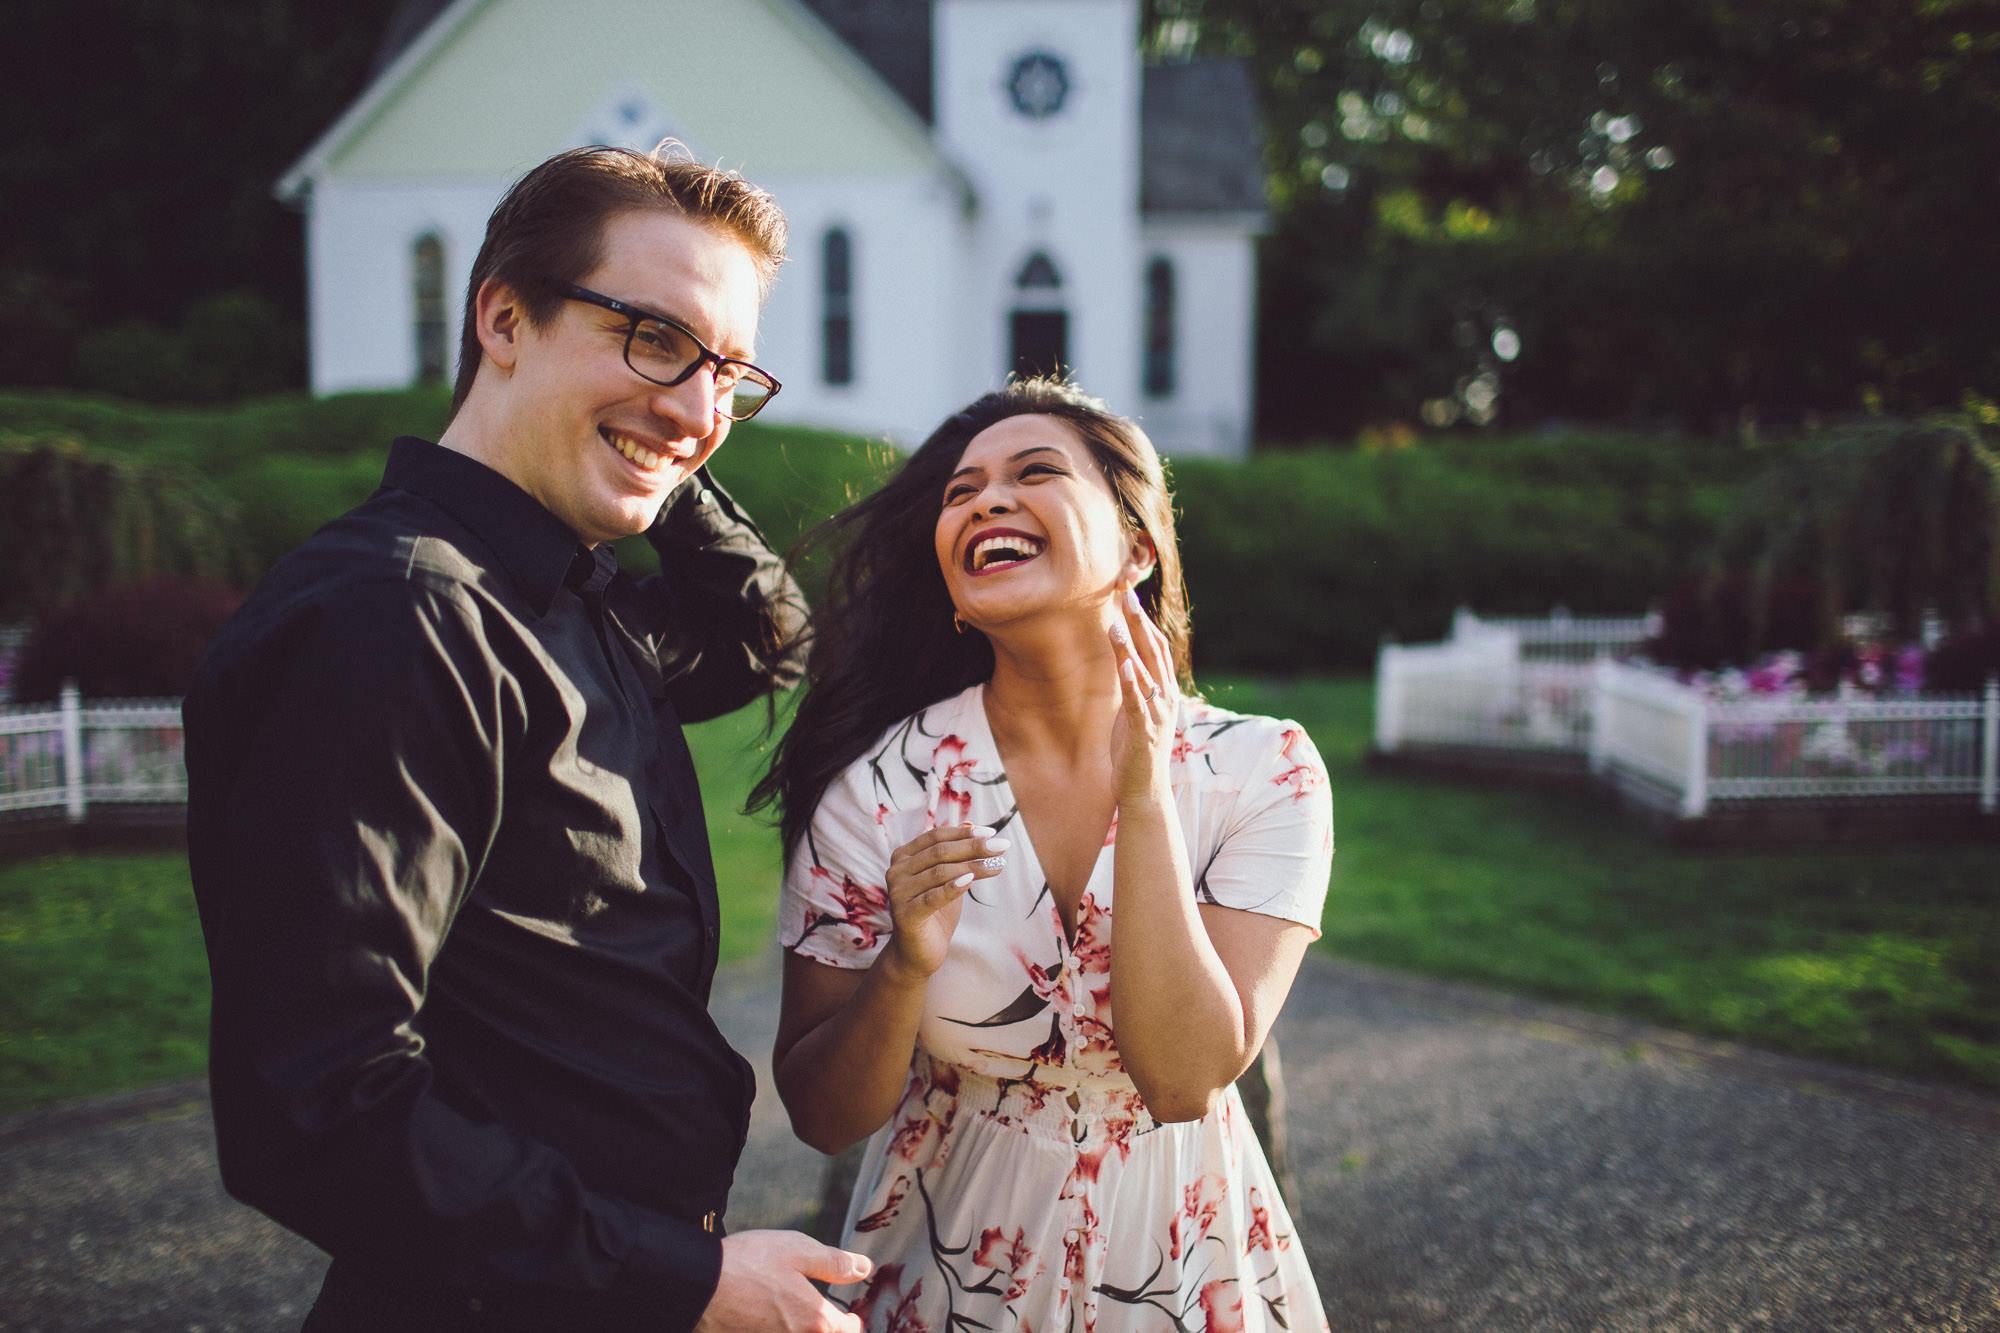 Allie & Doug's Engagement Session - Minoru Chapel & Terra Nova Park